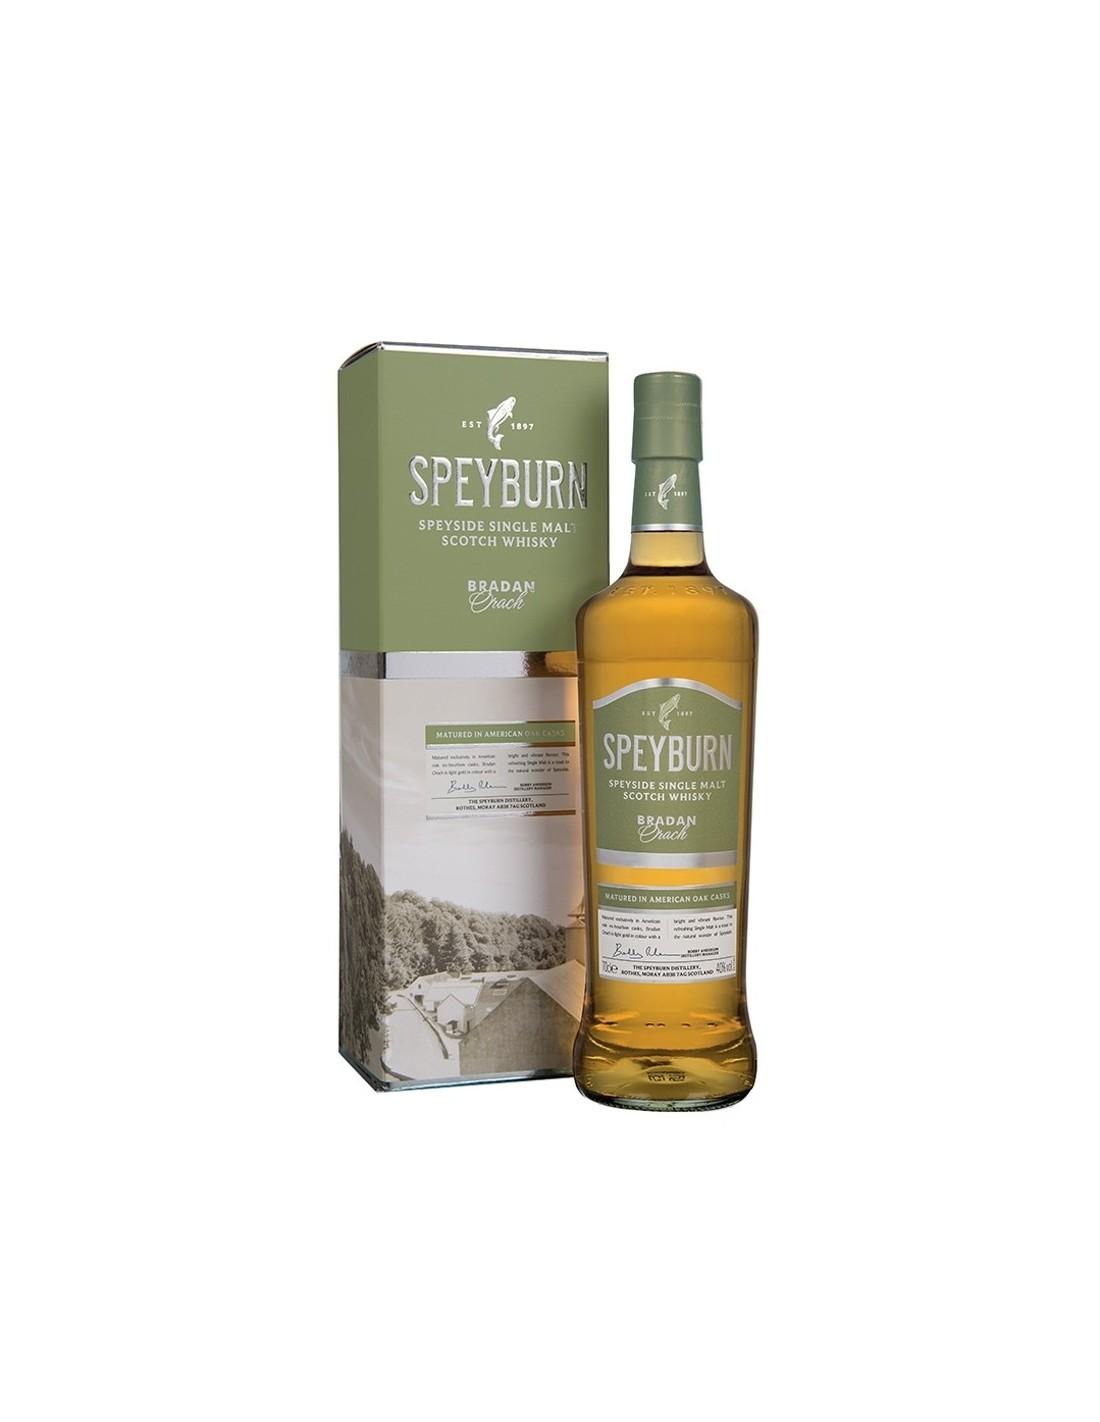 Whisky Speyburn Single Malt Bradan Orach, 40% alc., 0.7L, Scotia